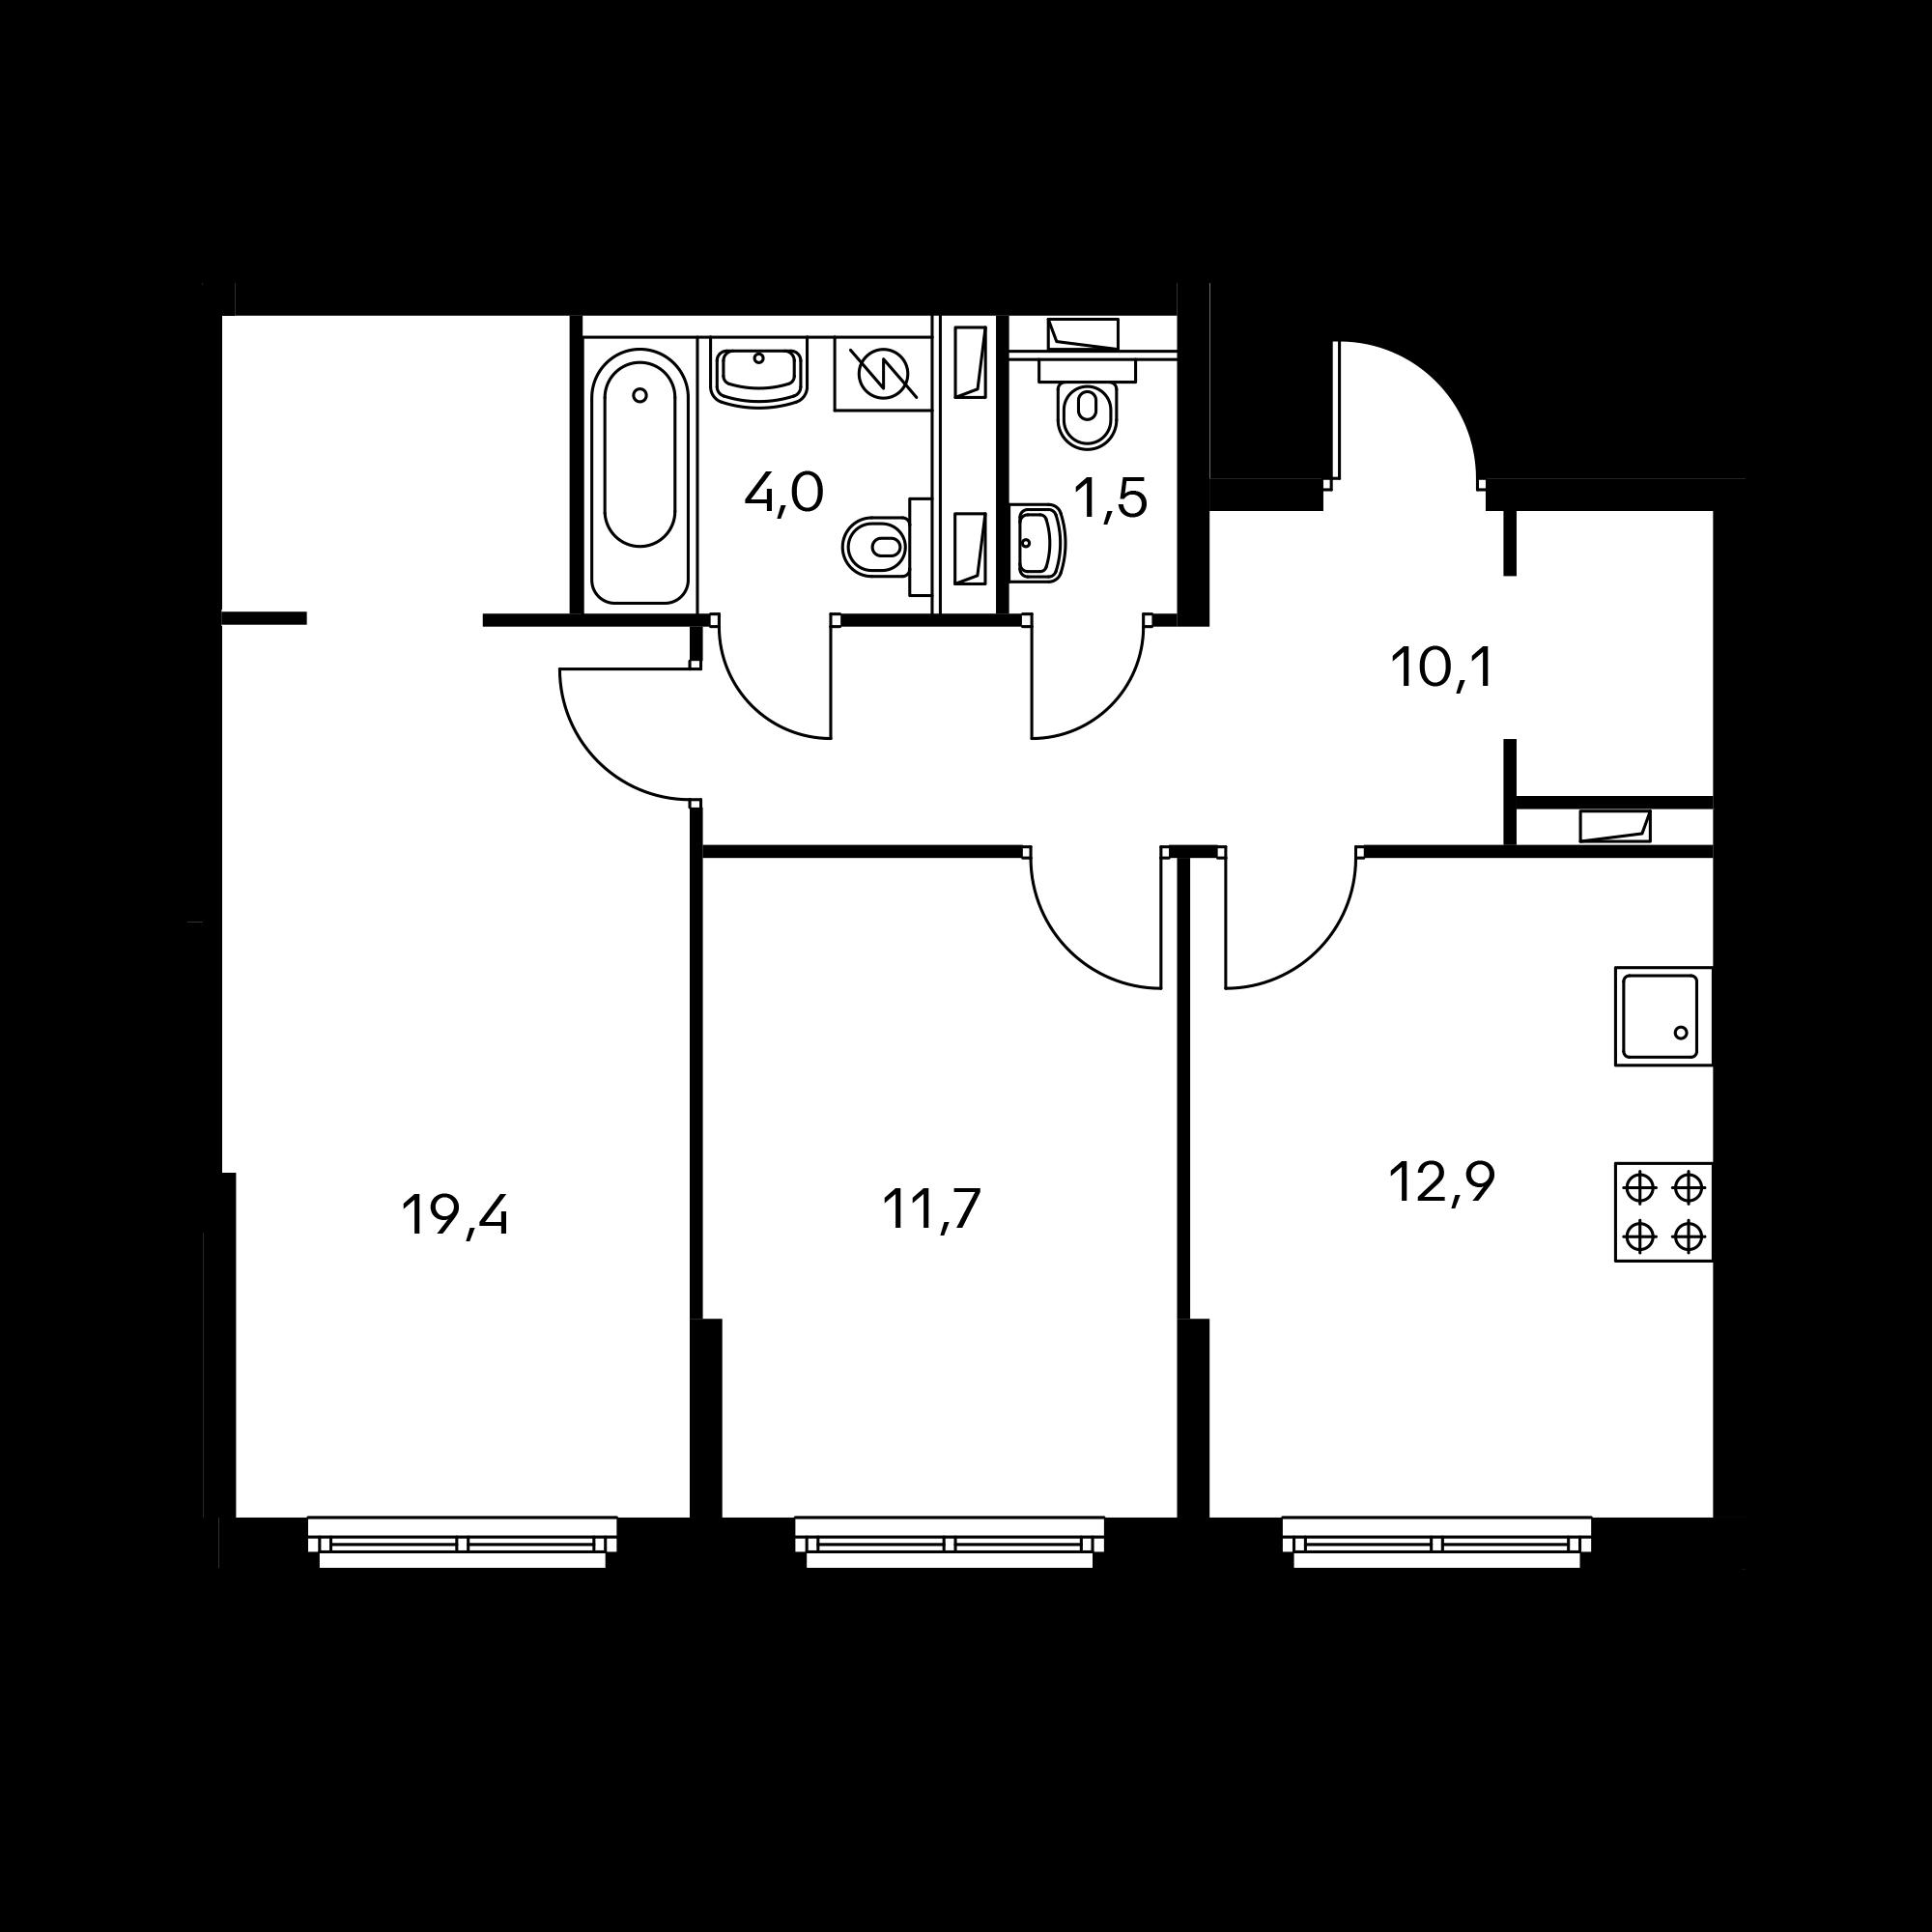 2KM4_9.3-1_S_Z